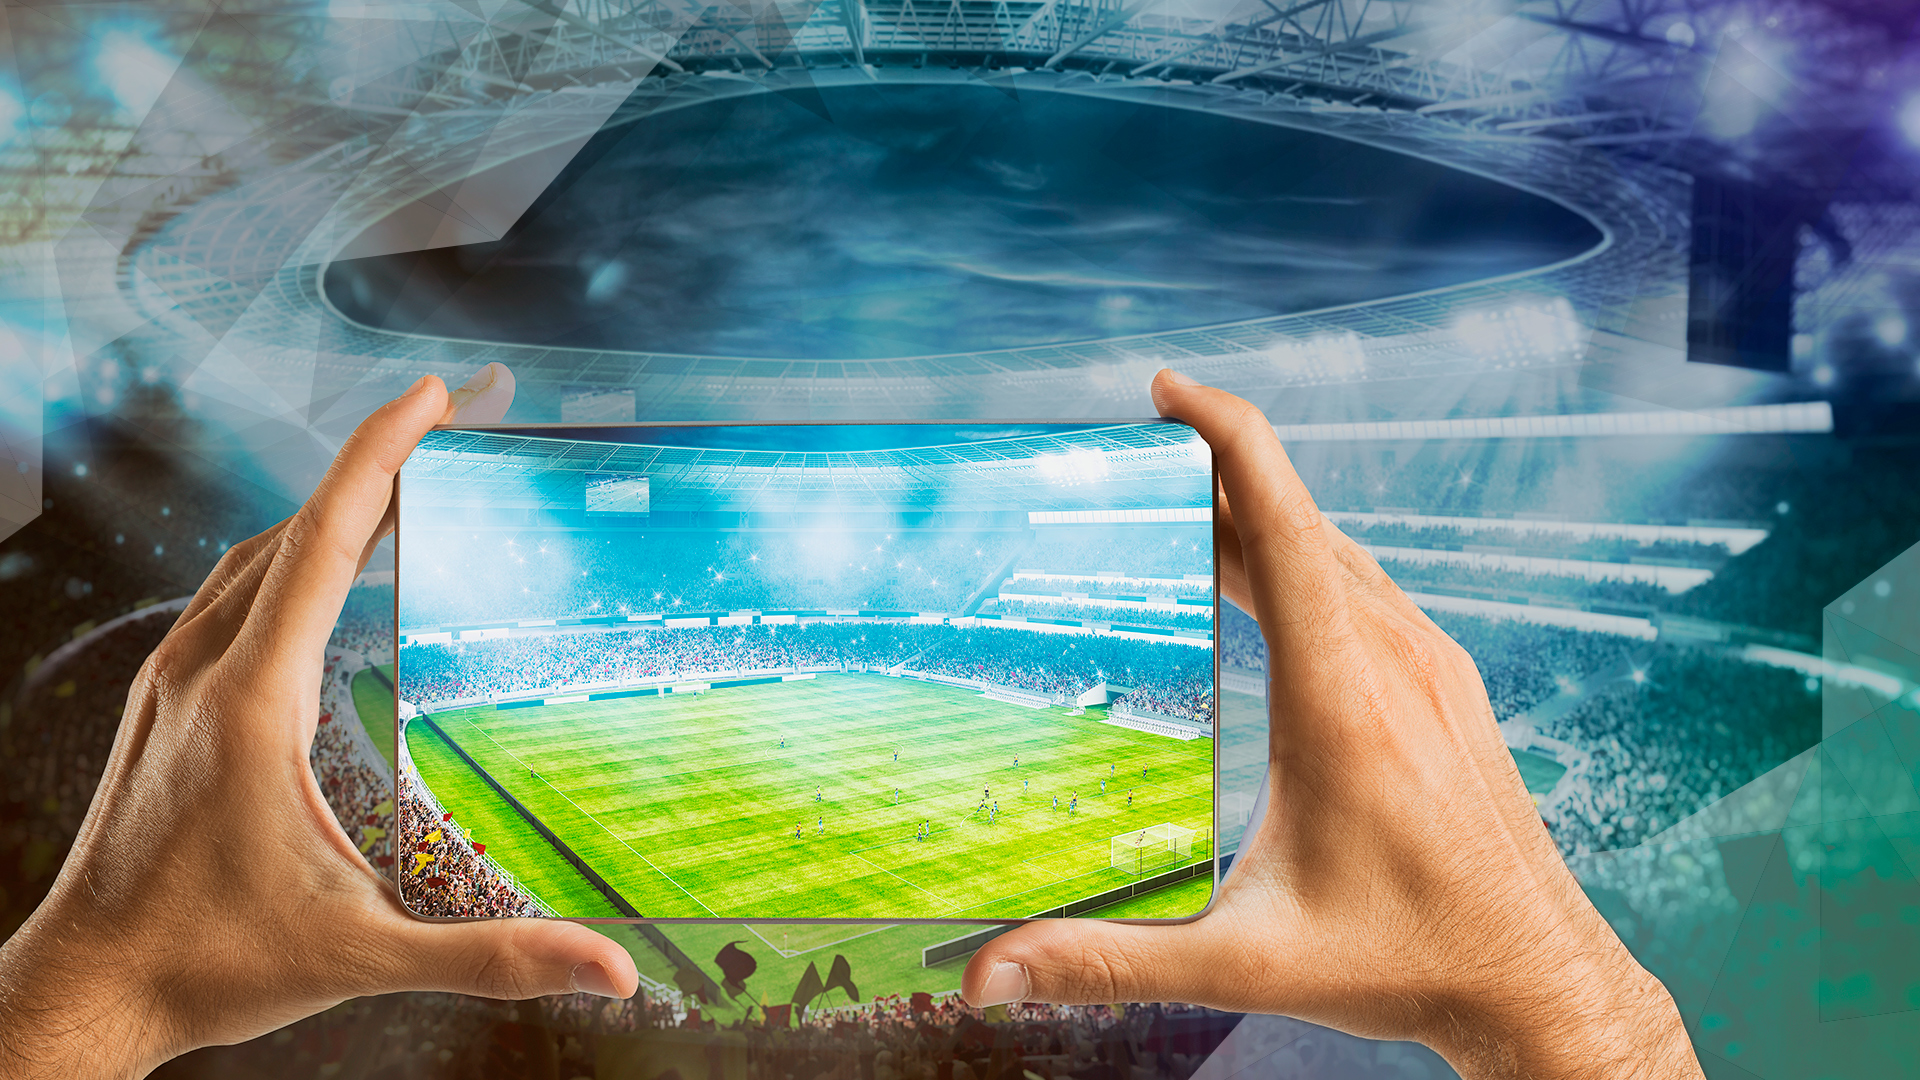 Streaming, Tv, Fernsehen, Stream, Fernseher, Videostreaming, Fußball, Sport, Spieler, Bundesliga, Wm, Sportler, Fussball, Mannschaft, EM, UEFA, Fussball-WM, Fans, Fan, Europameisterschaft, Sportveranstaltung, Stadion, Fussballer